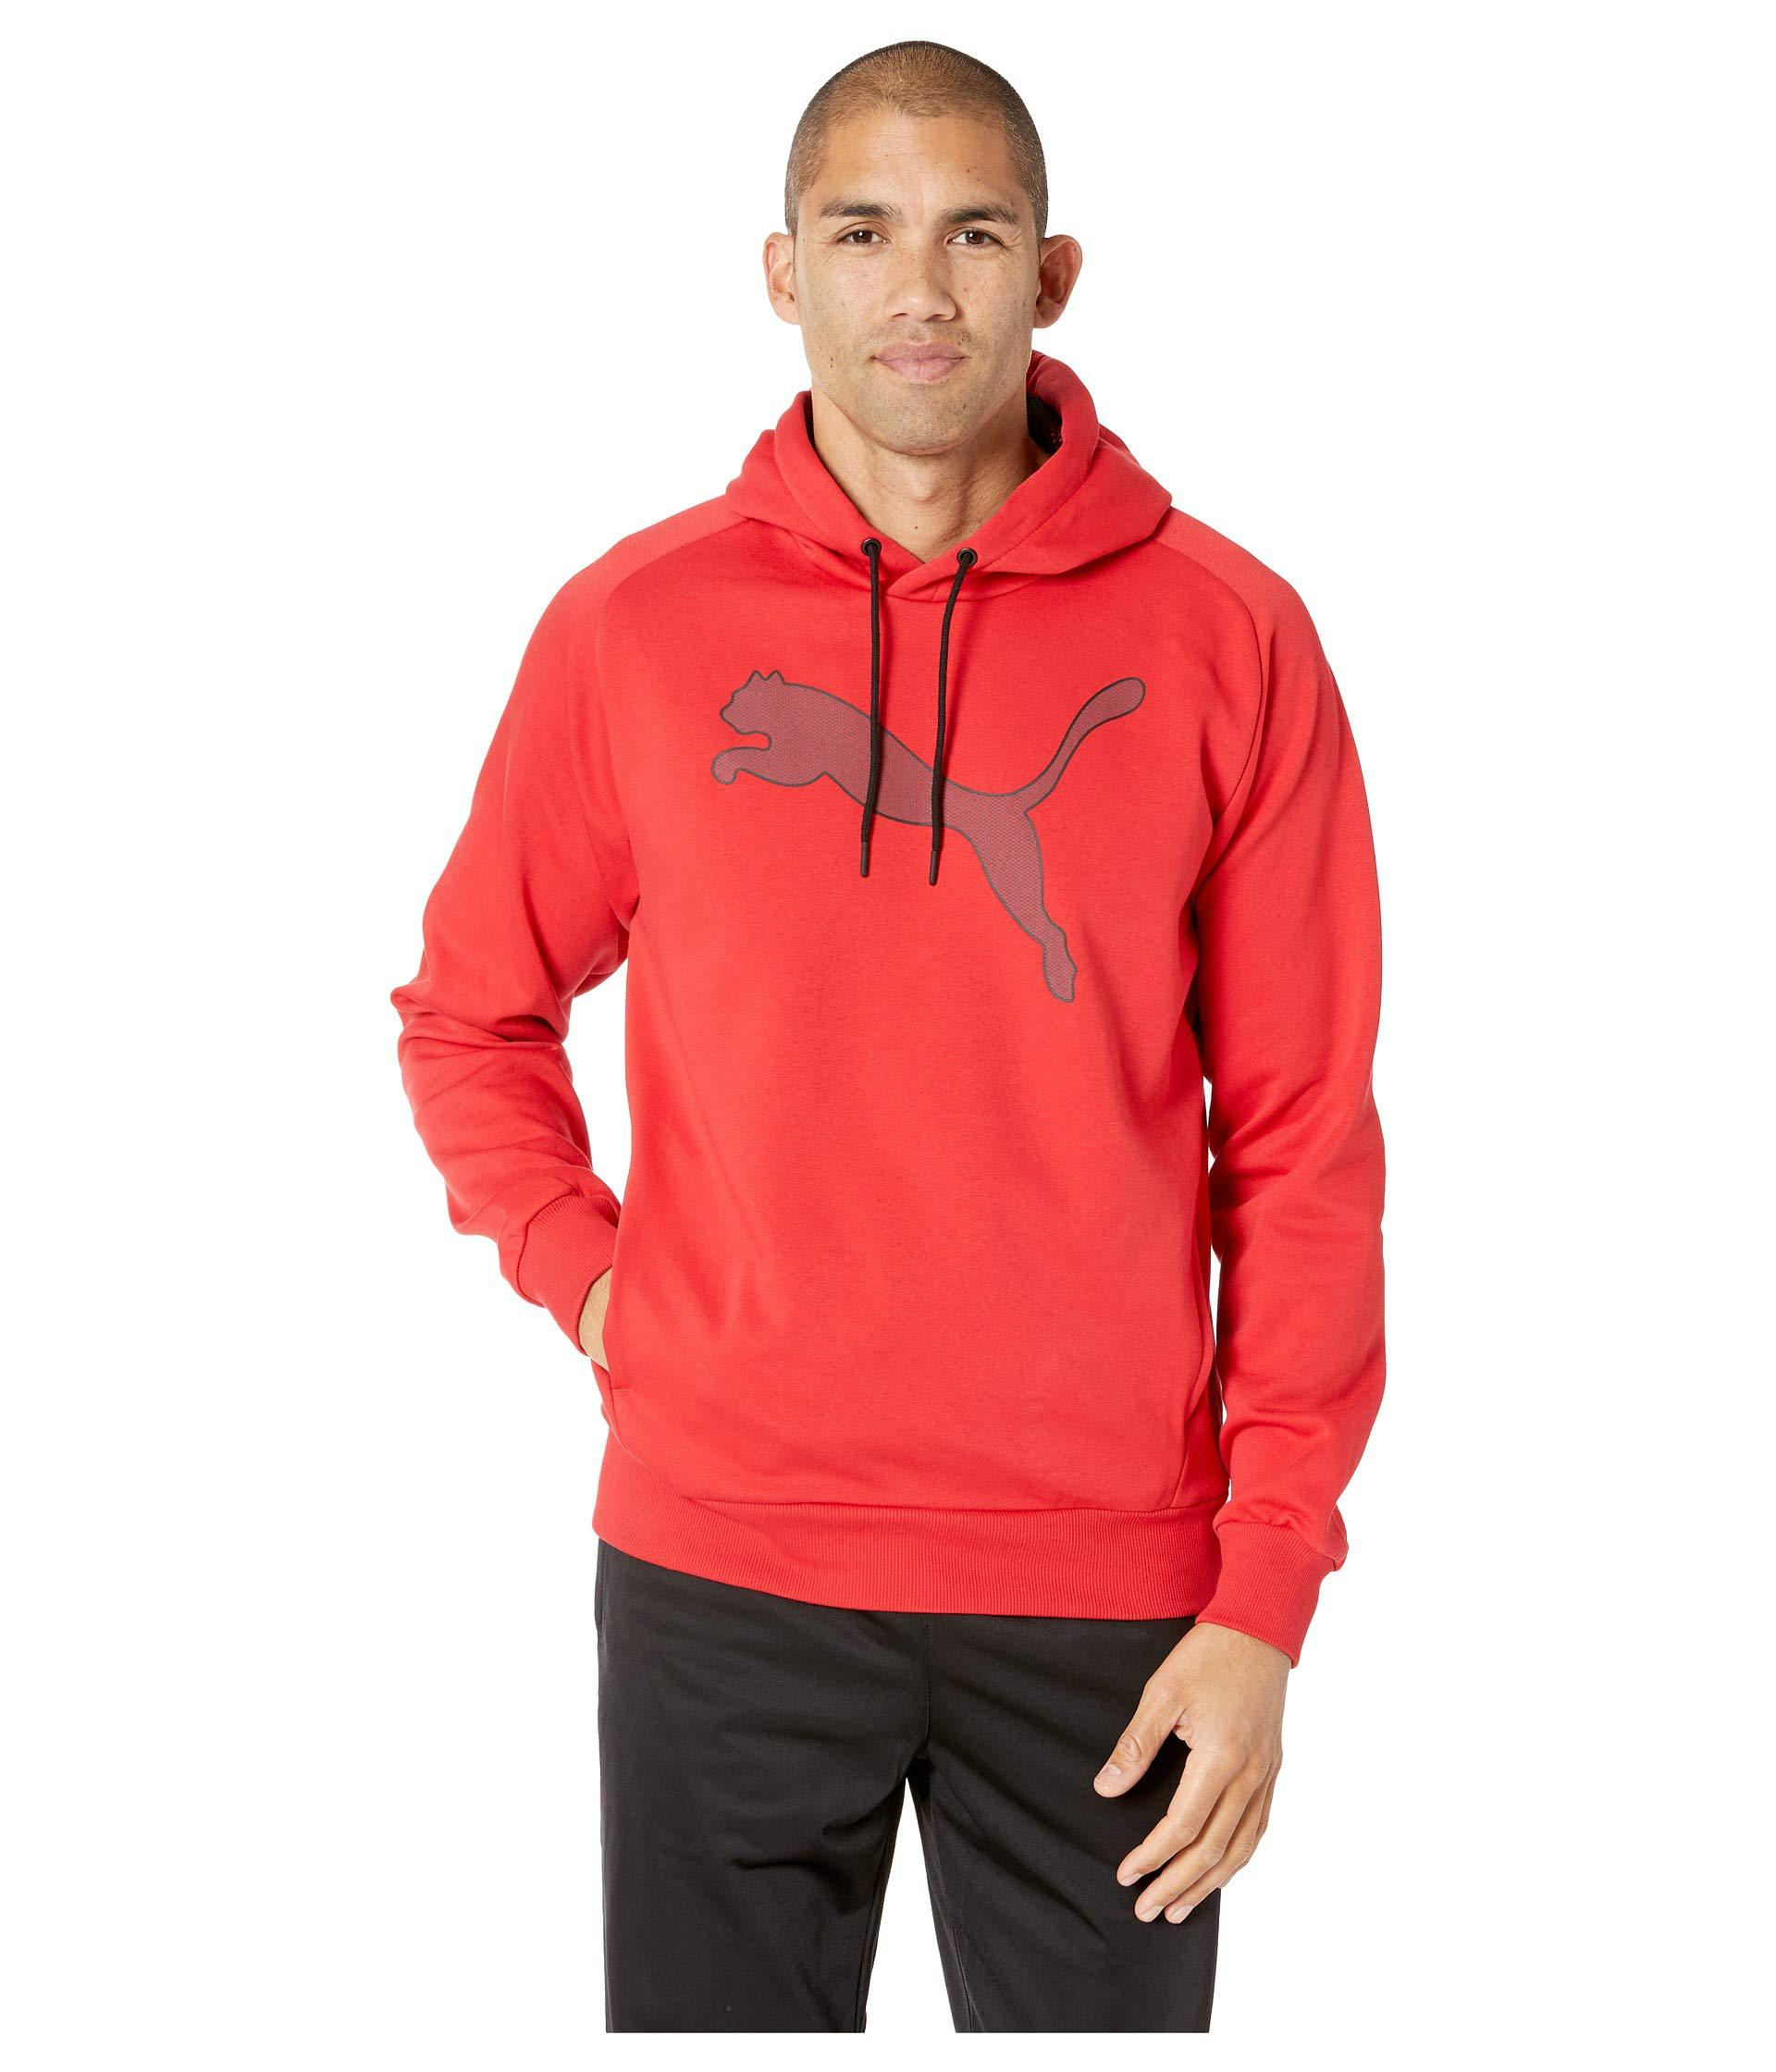 836ca5a221d8 Lyst - PUMA P48 Modern Sports Fleece Hoodie (ribbon Red) Men s ...